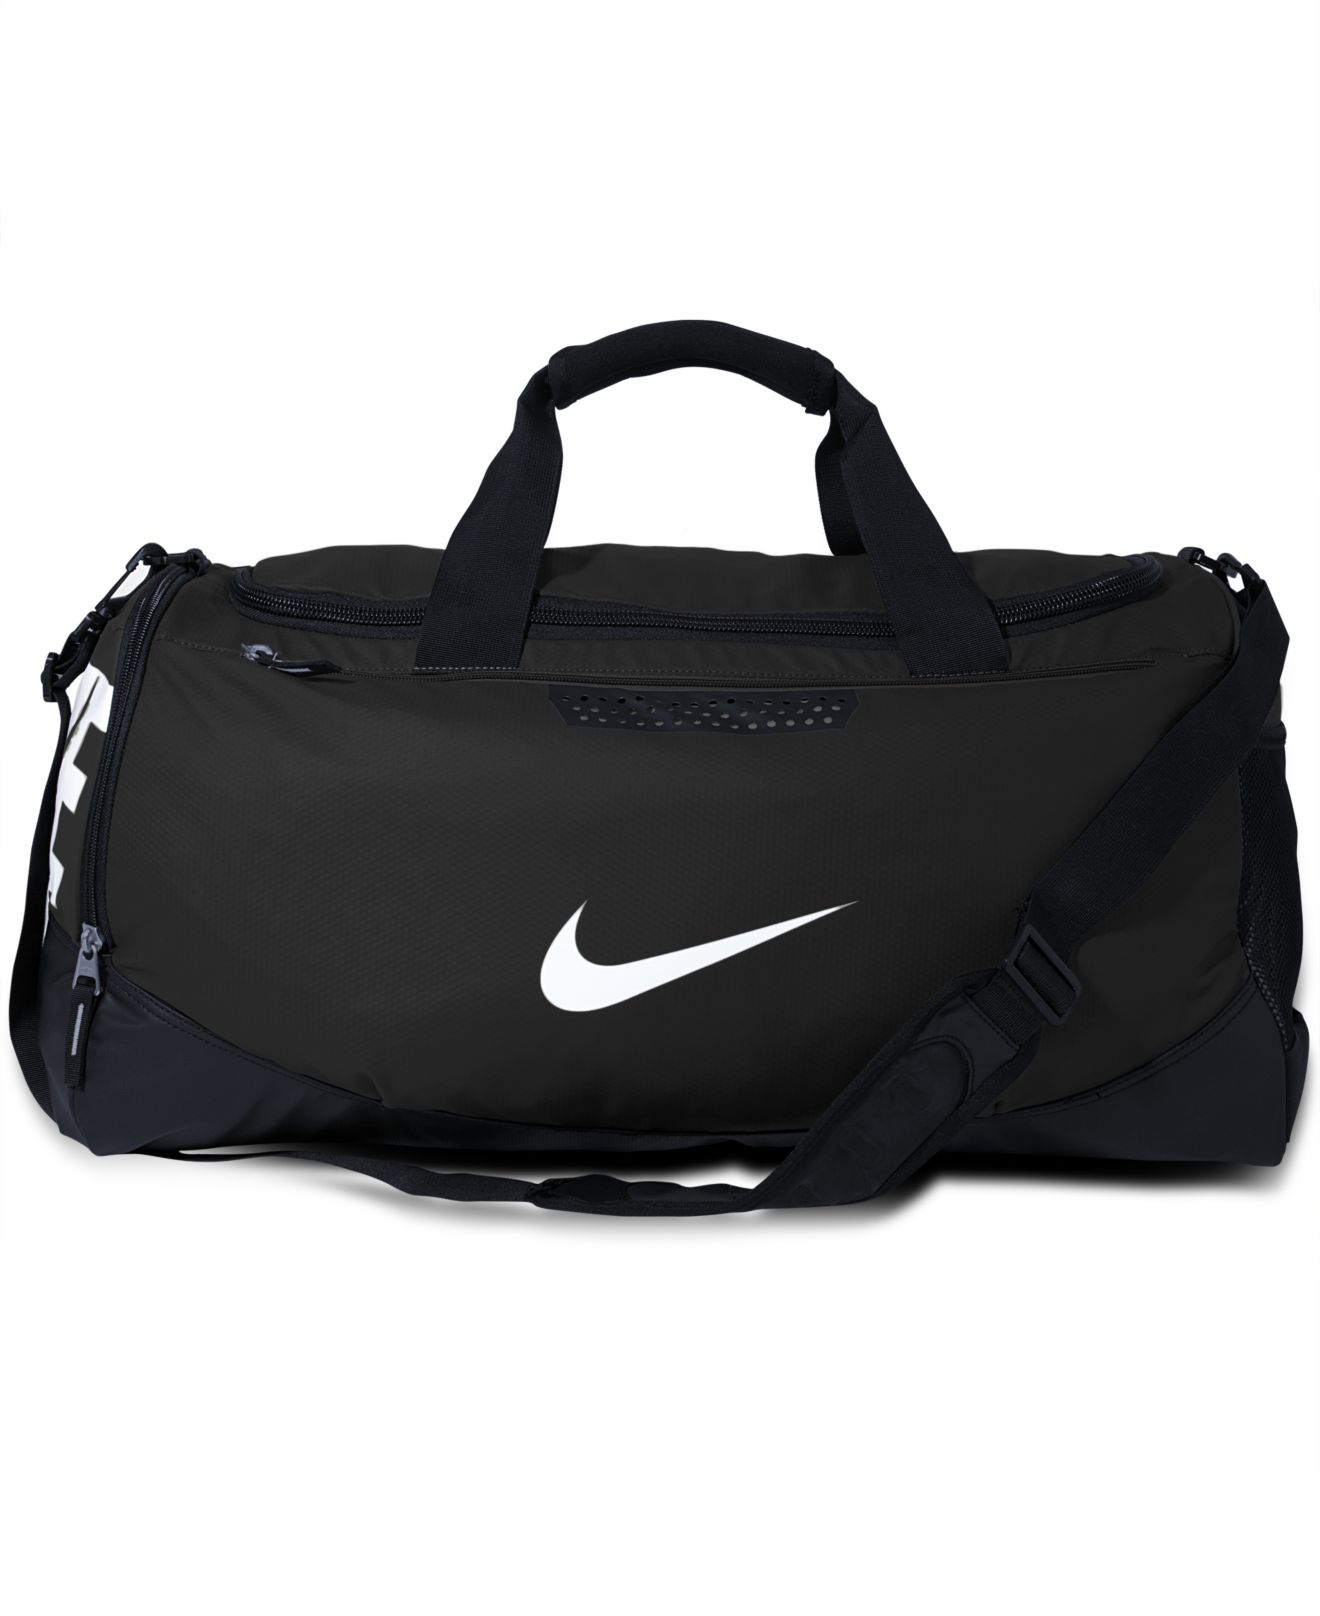 b8832271a16a Lyst - Nike Water Resistant Team Training Medium Duffle Bag in Blue ...